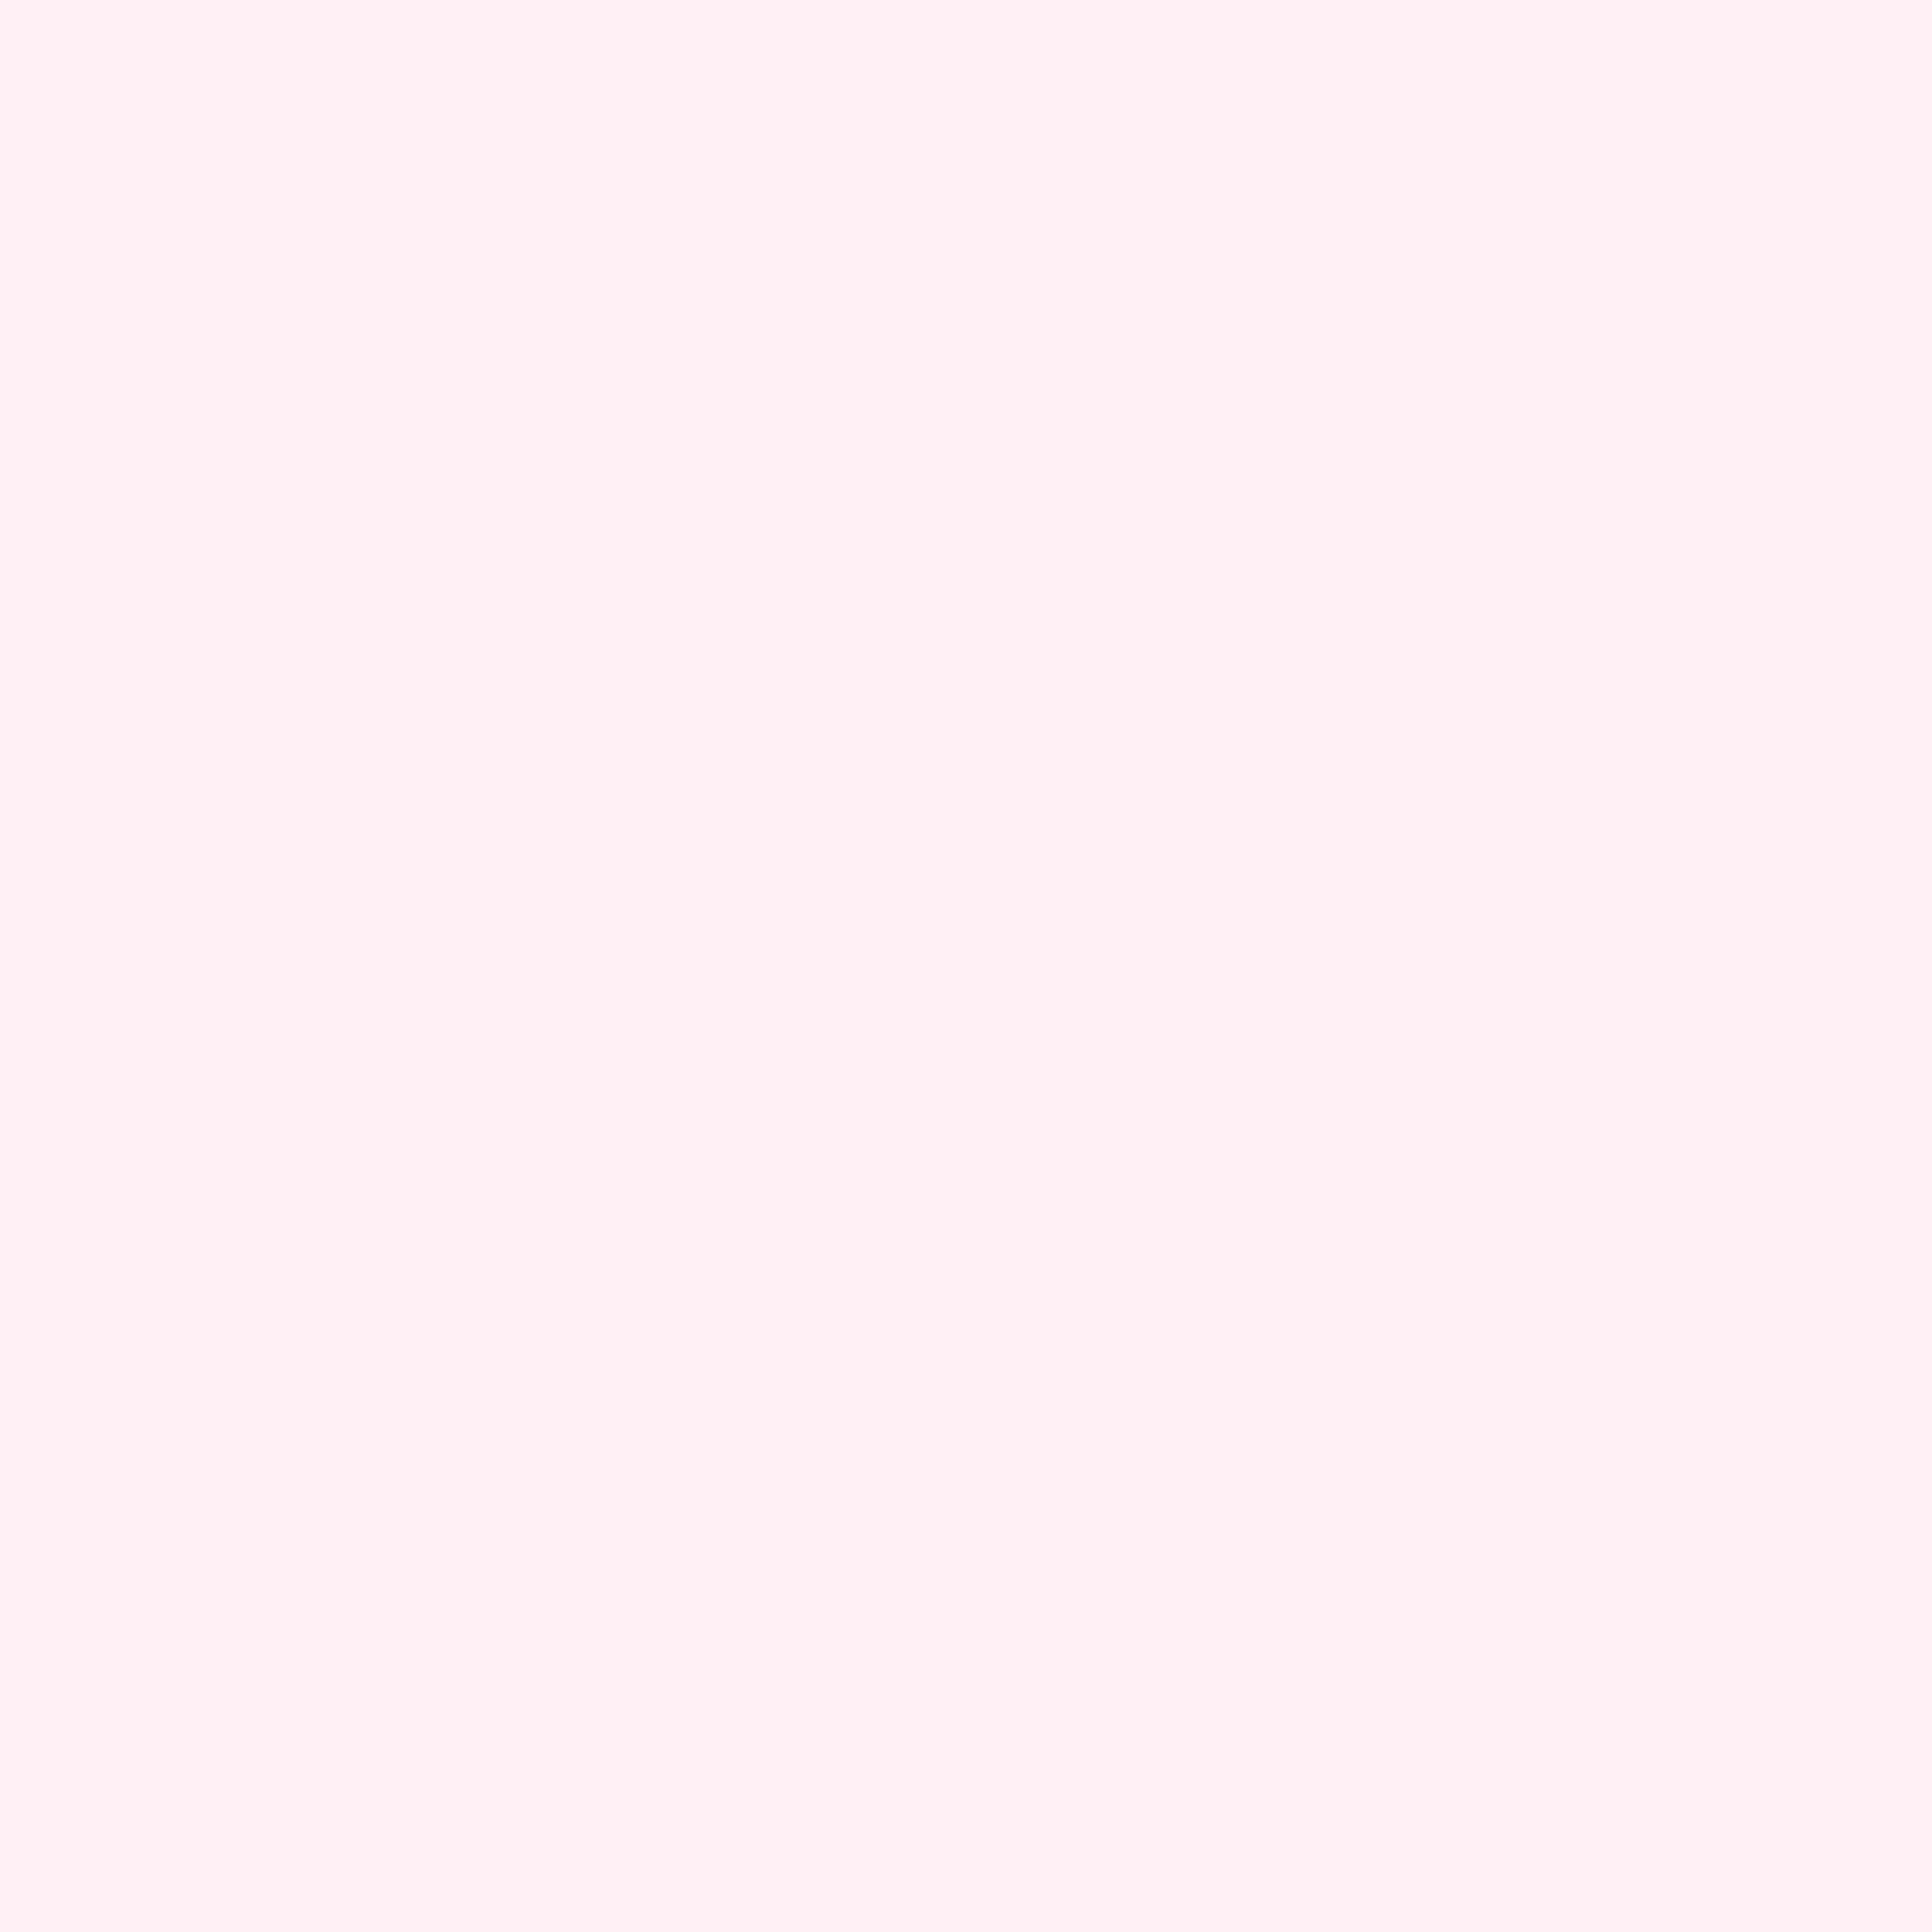 2732x2732 Lavender Blush Solid Color Background